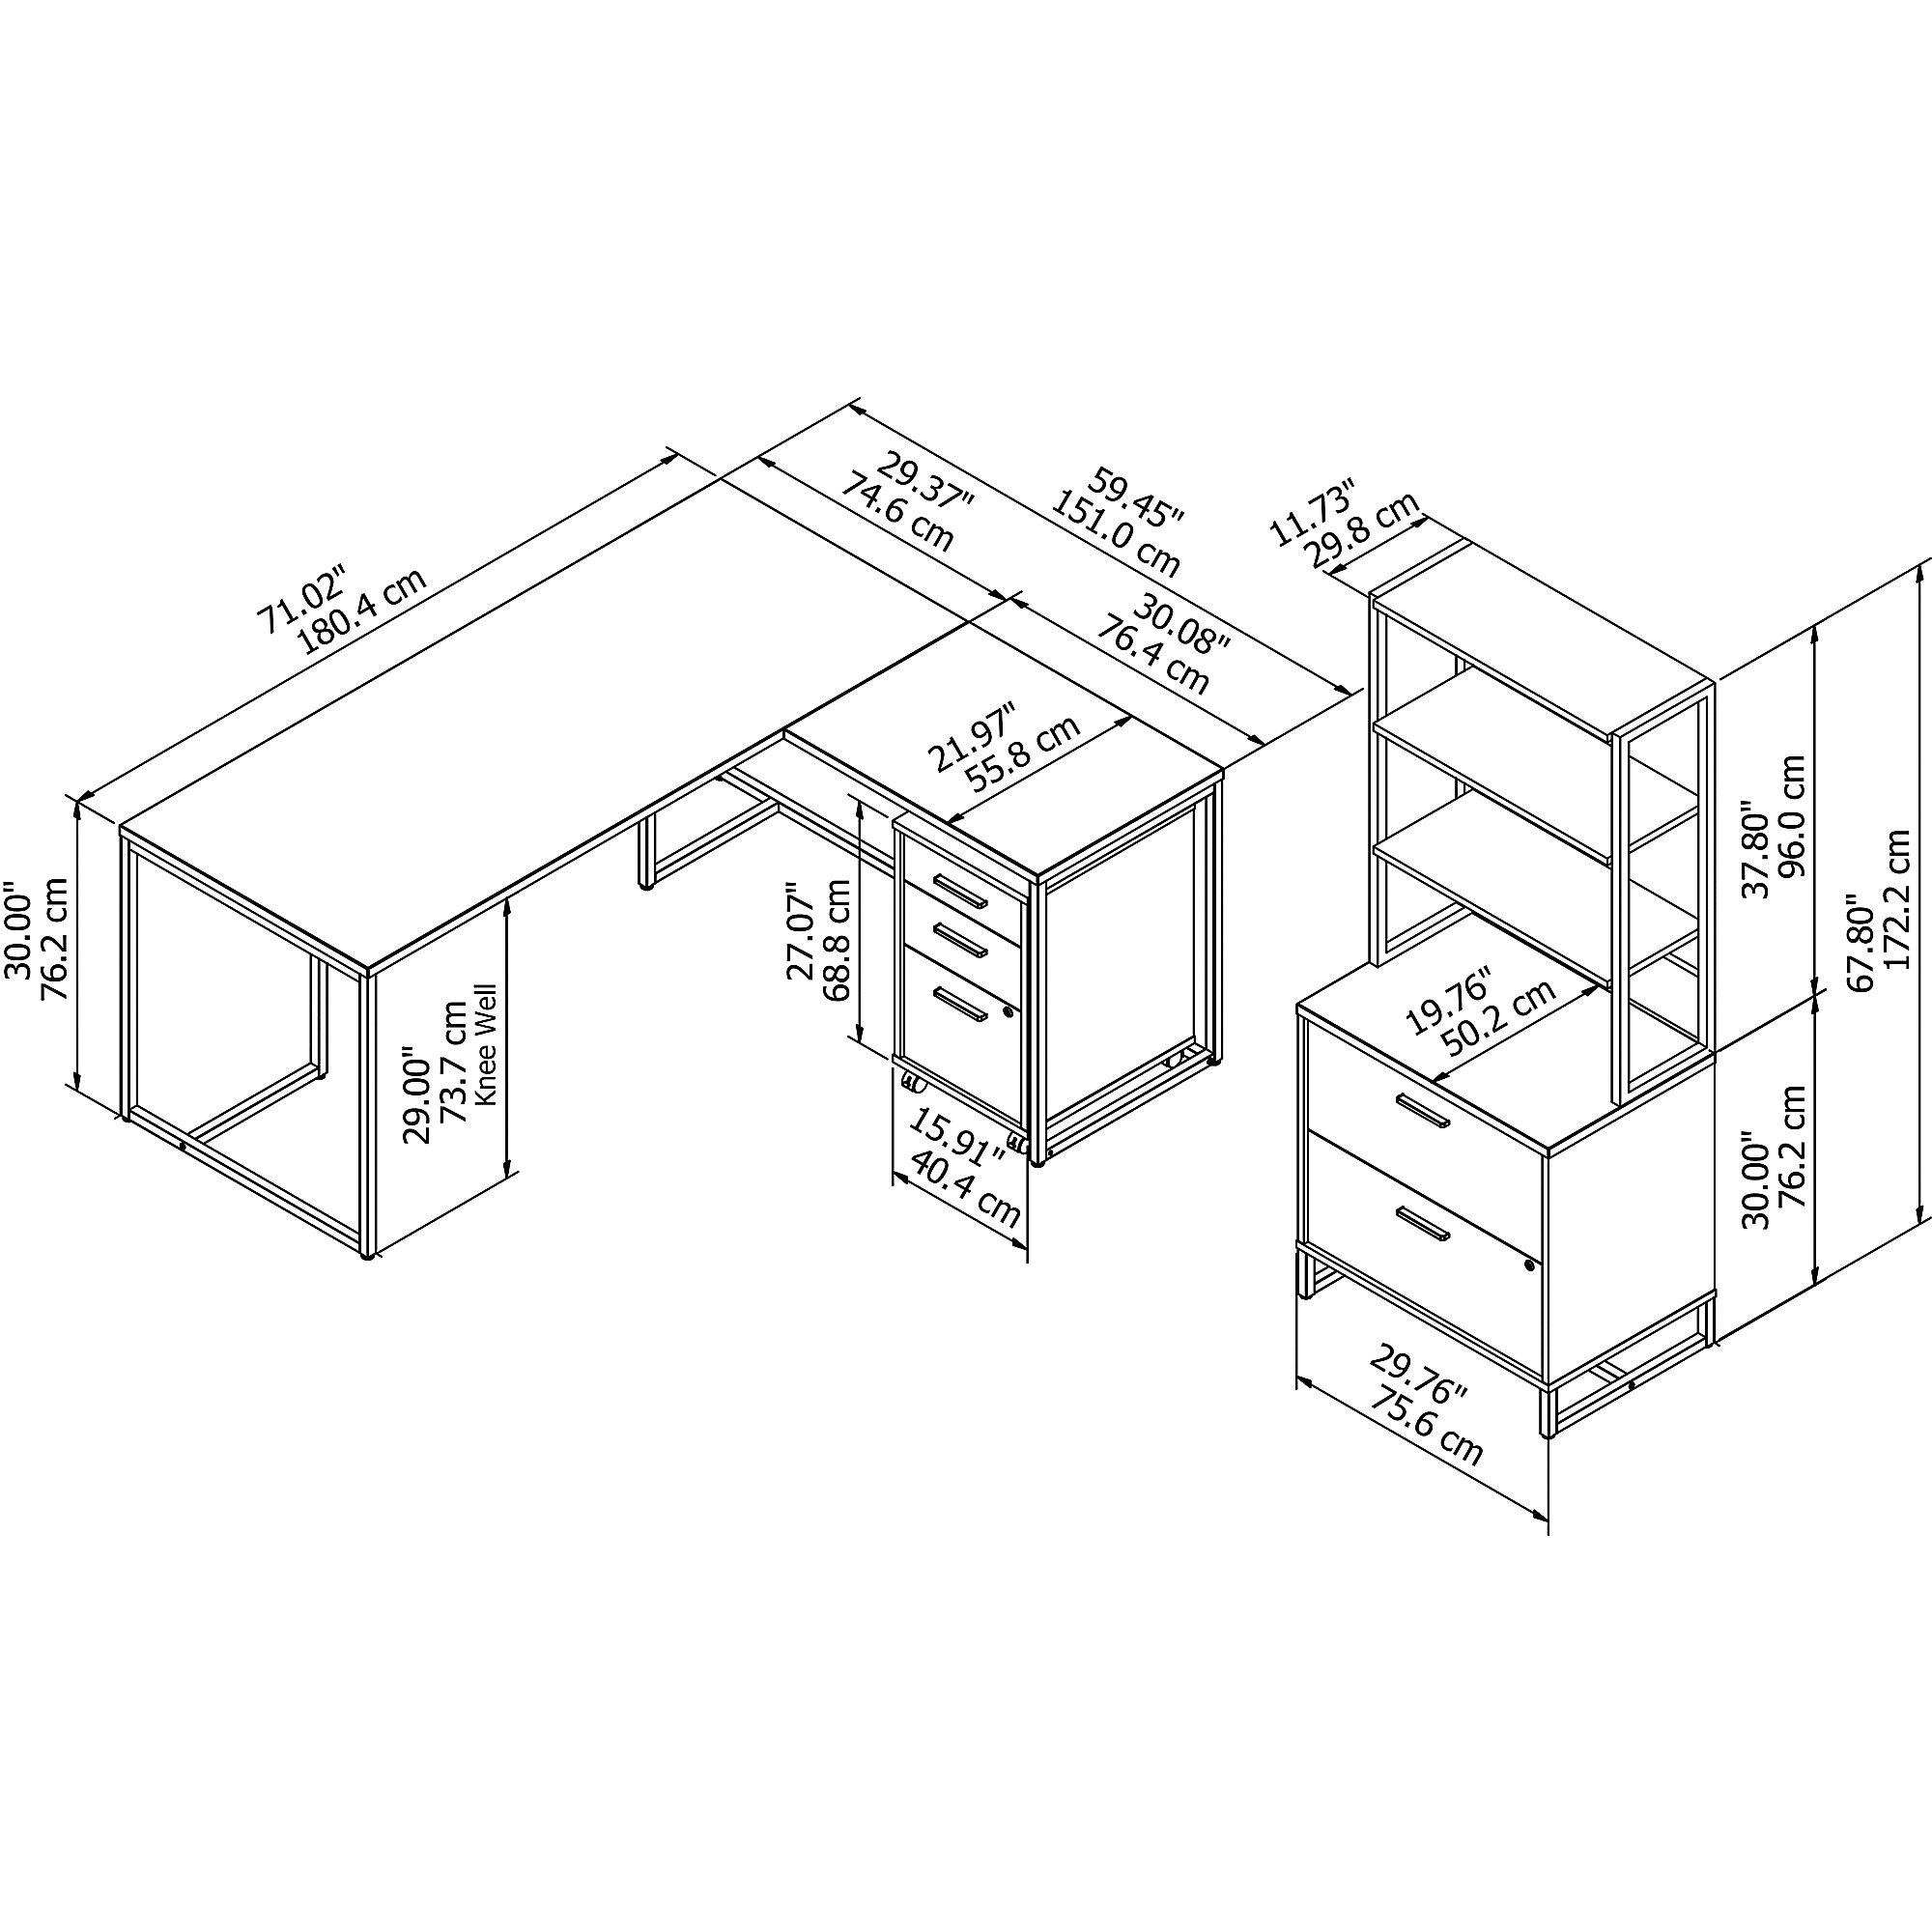 kathy ireland method executive furniture set dimensions